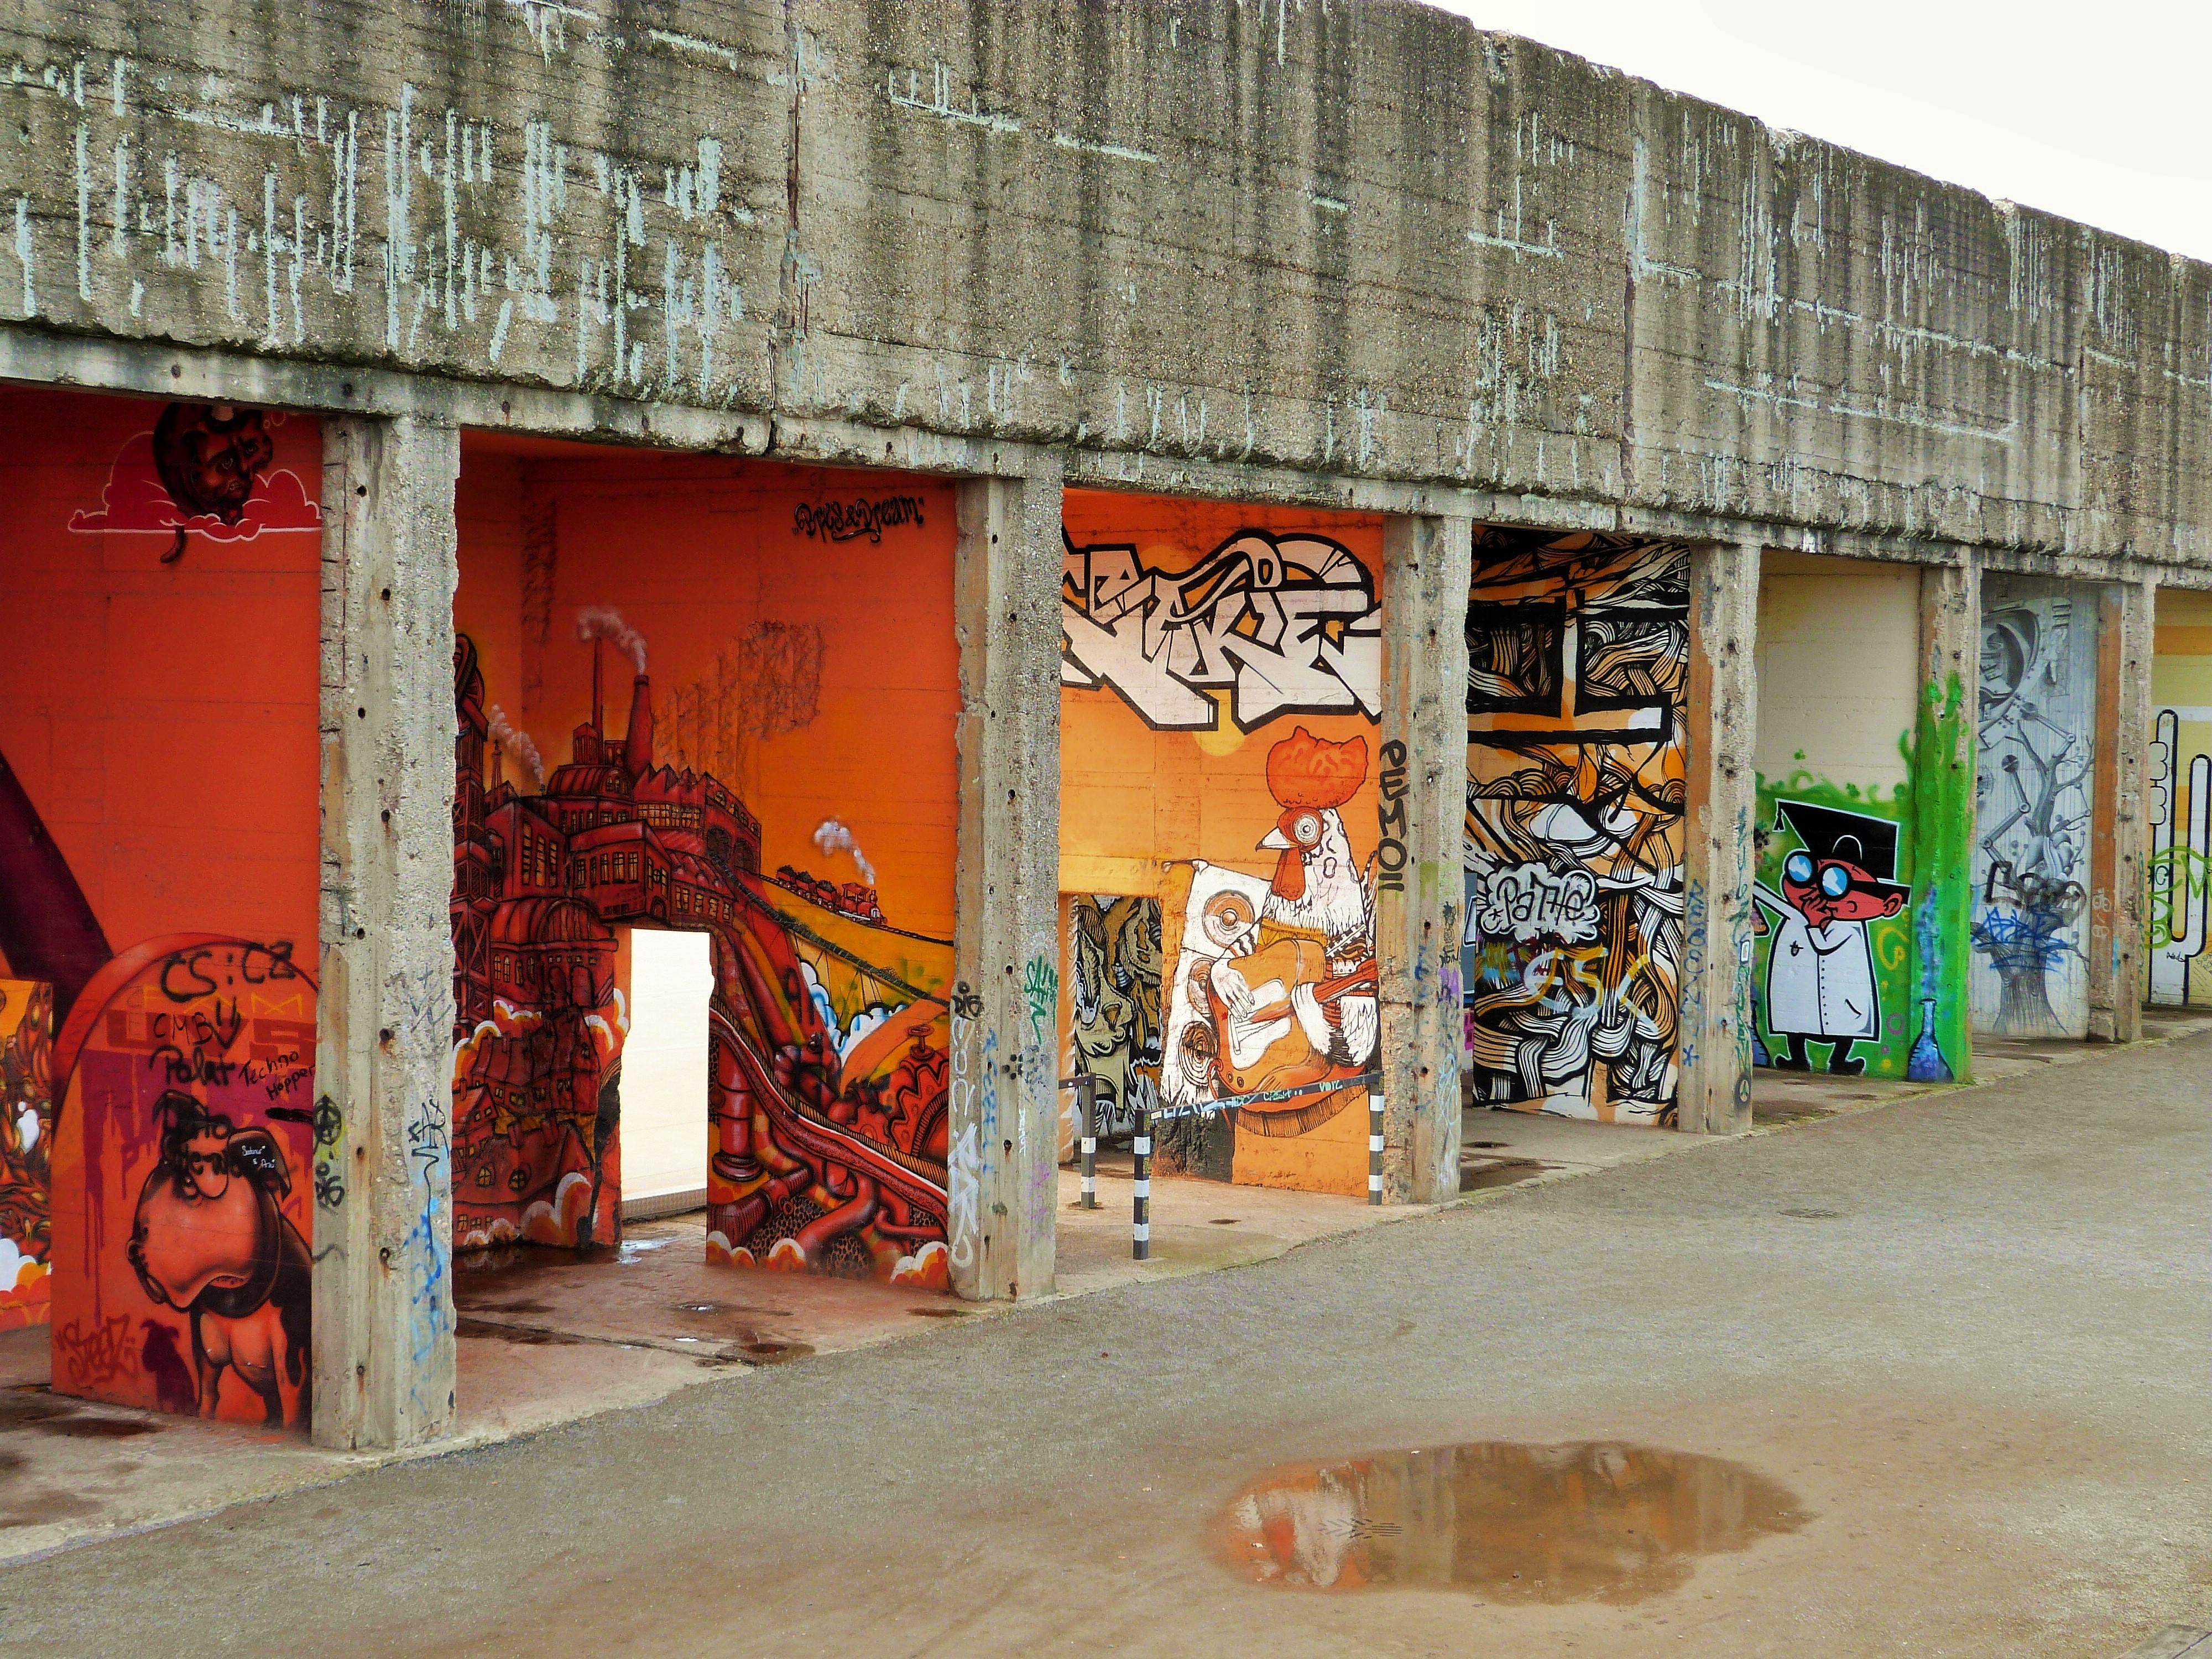 rheinpark graffiti duisburg continental breakfast travel